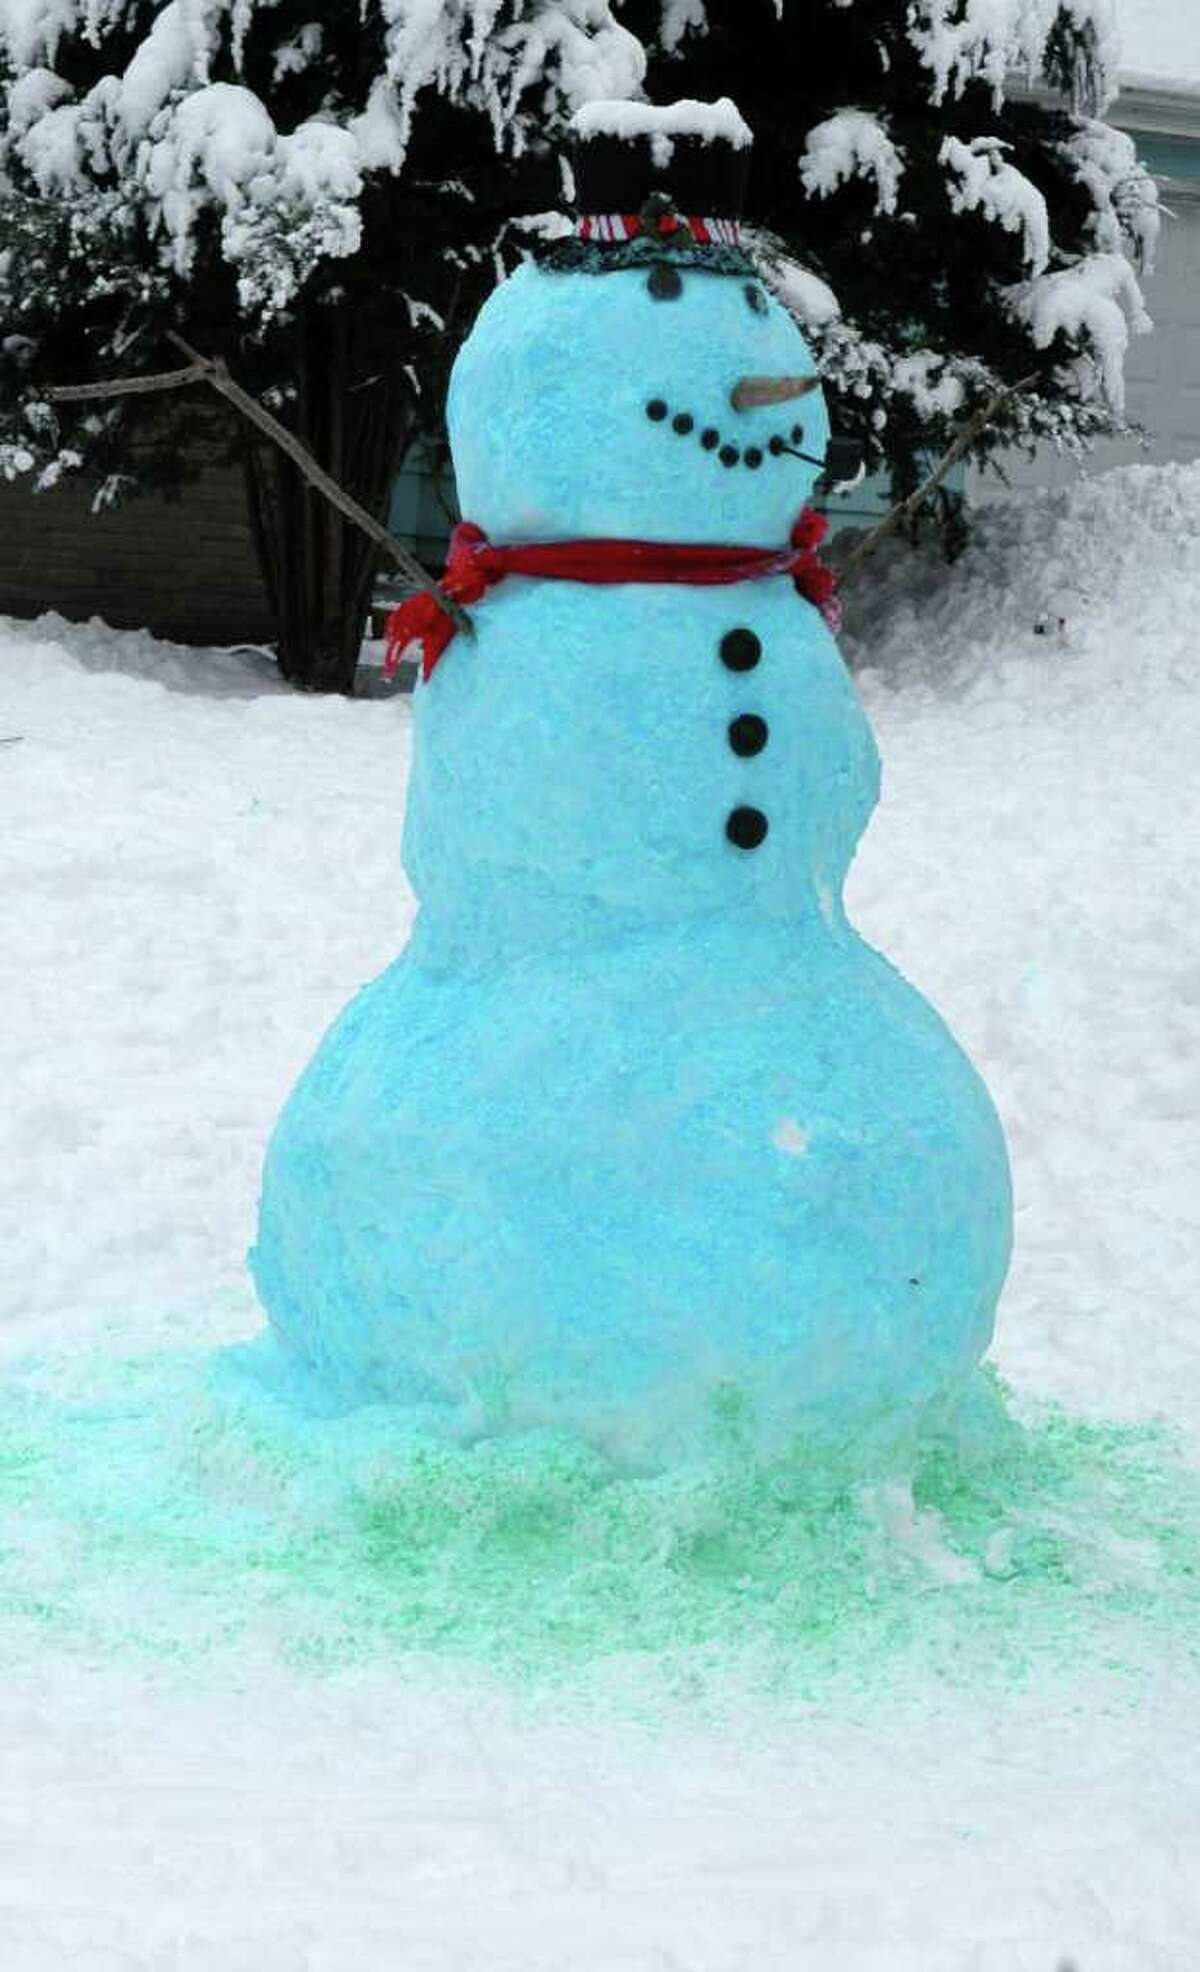 Snowmen get the